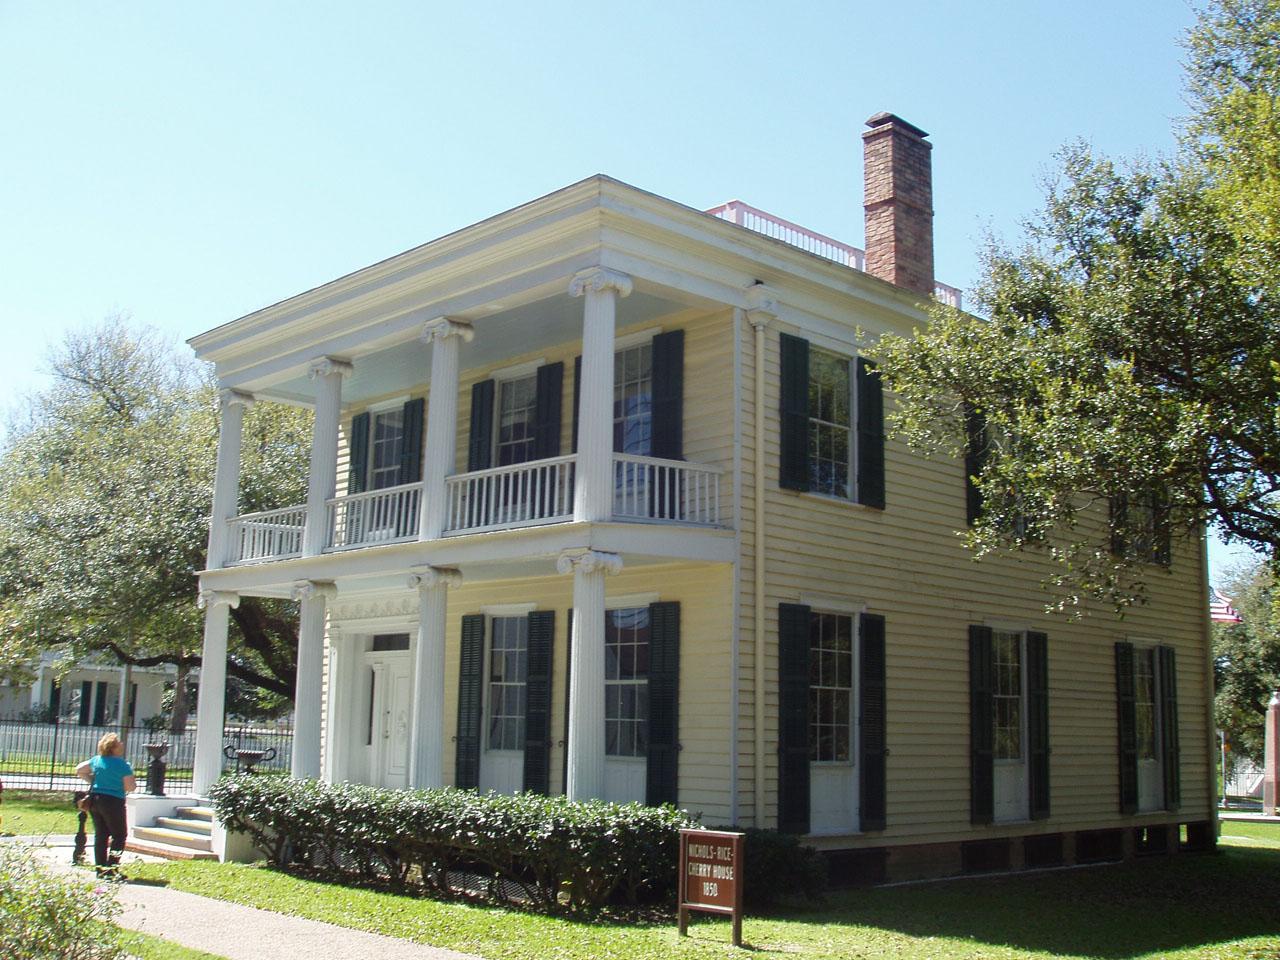 File:Nichols-Rice-Cherry House.jpg - Wikimedia Commons